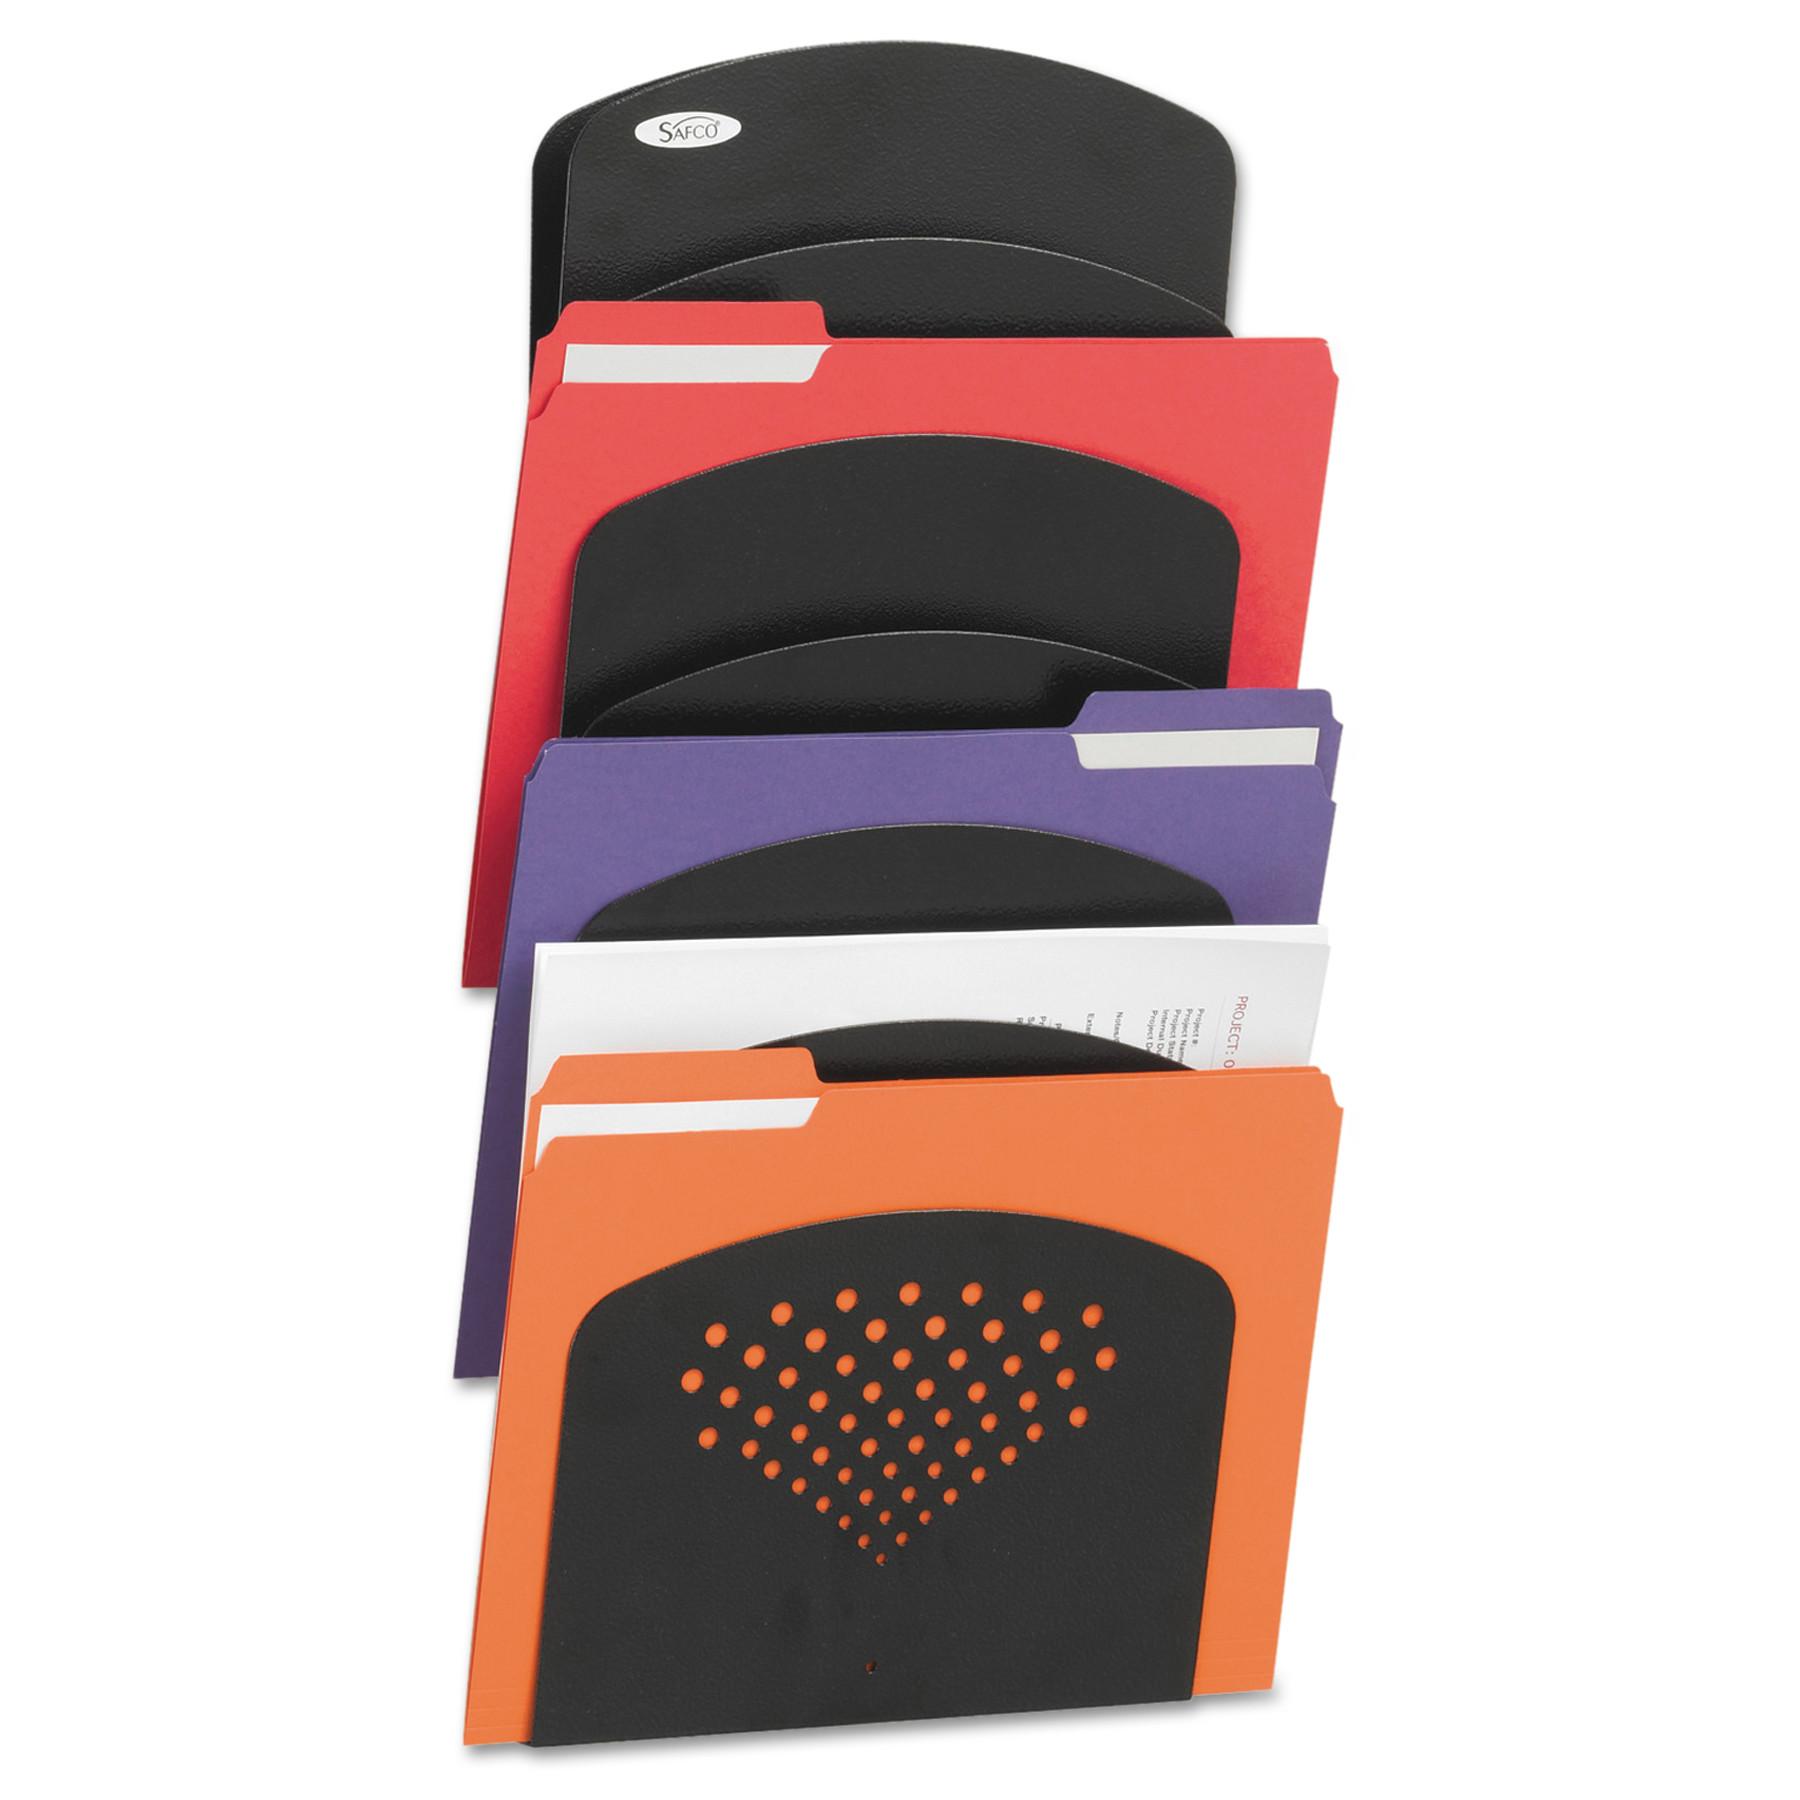 Safco Steel Wall Rack, Letter/Legal, Seven Pocket, Black, 91/2 x 2 x 21 3/4